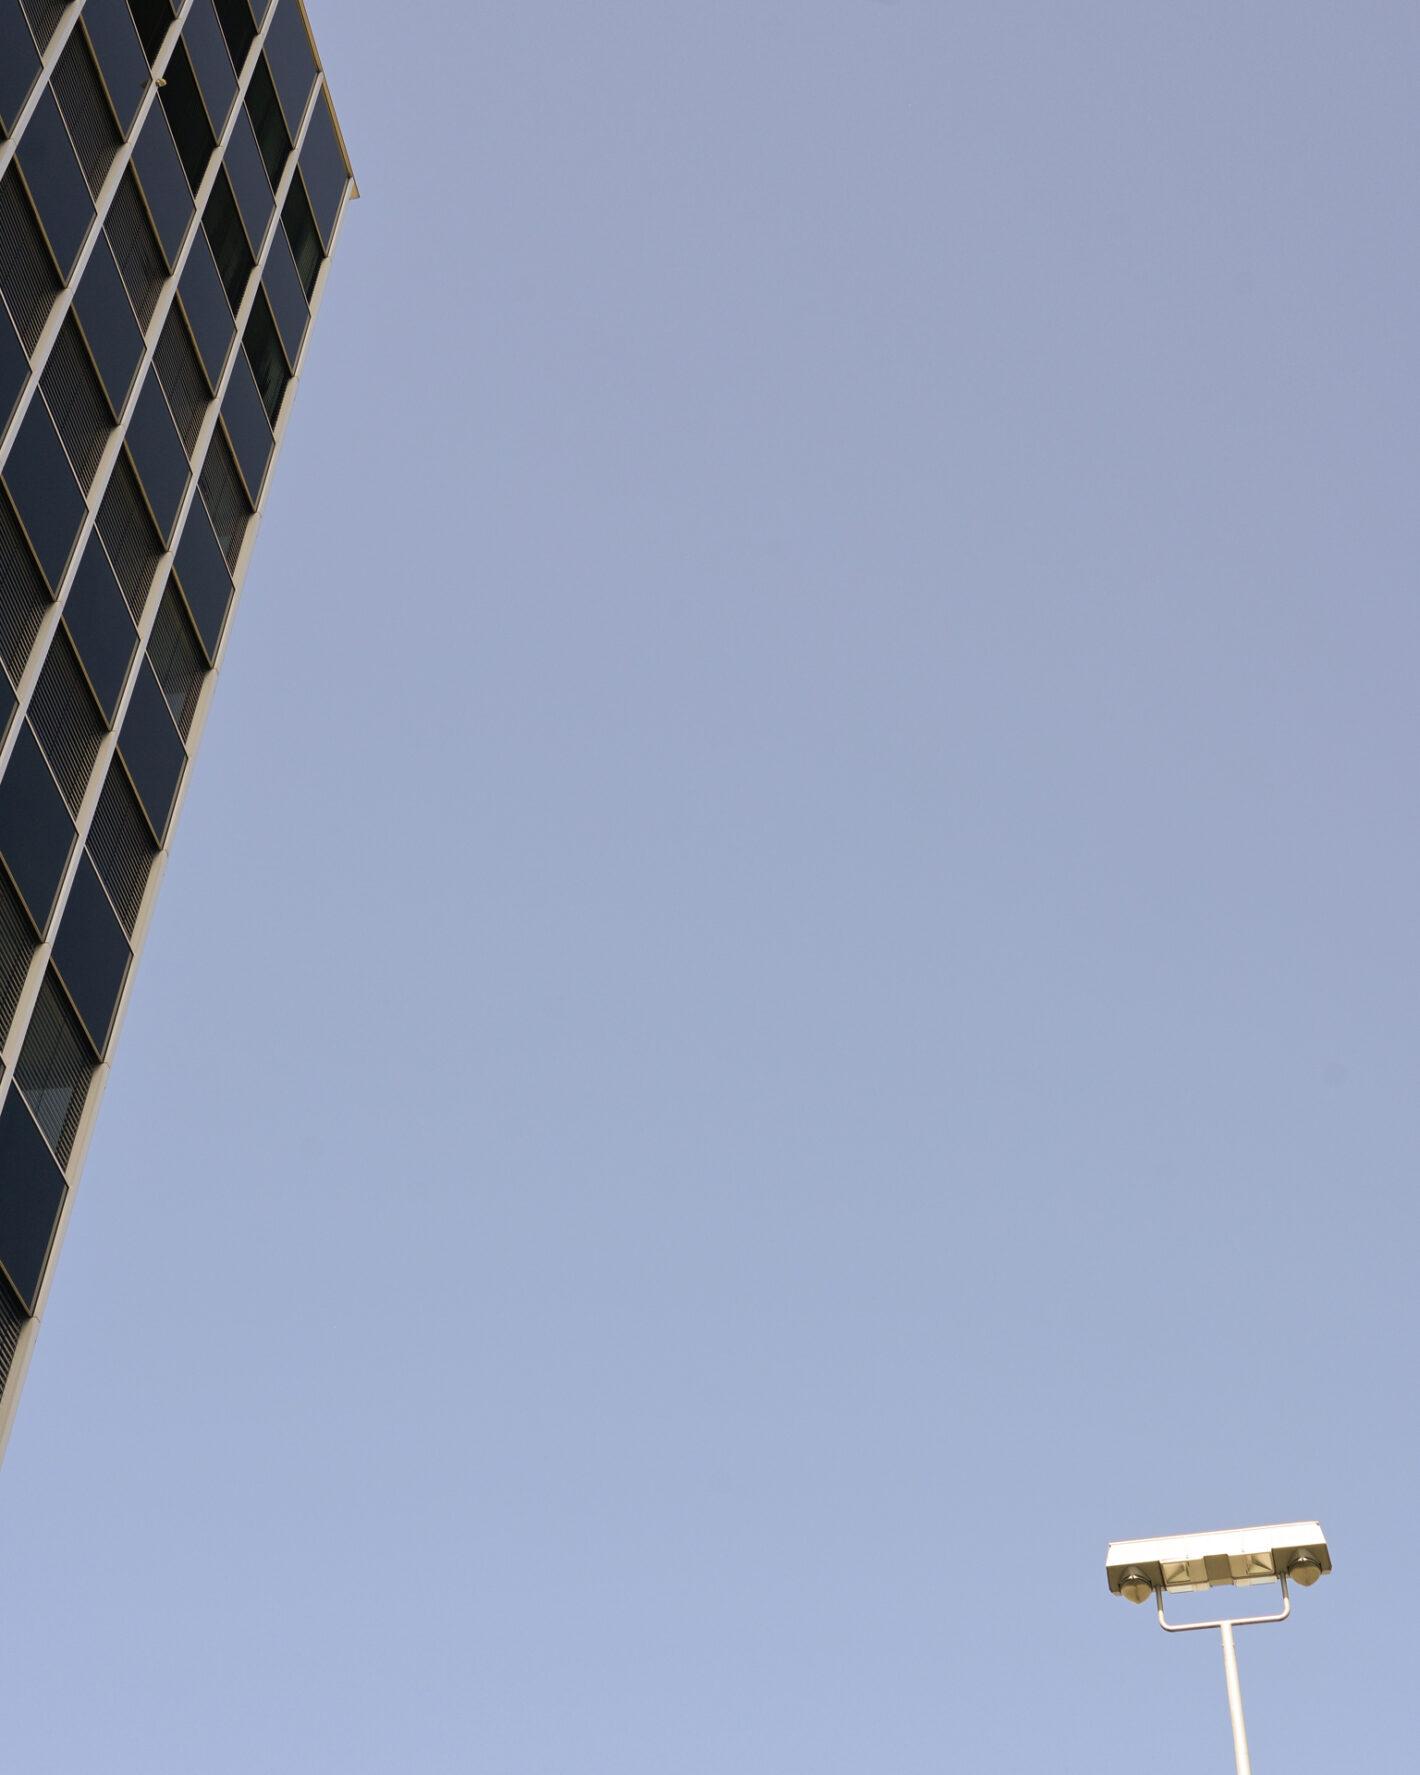 Cadrez différemment. Nikon Z fc + NIKKOR Z 28mm f/2.8 @ 28mm, 1/160s, f/10, ISO 100